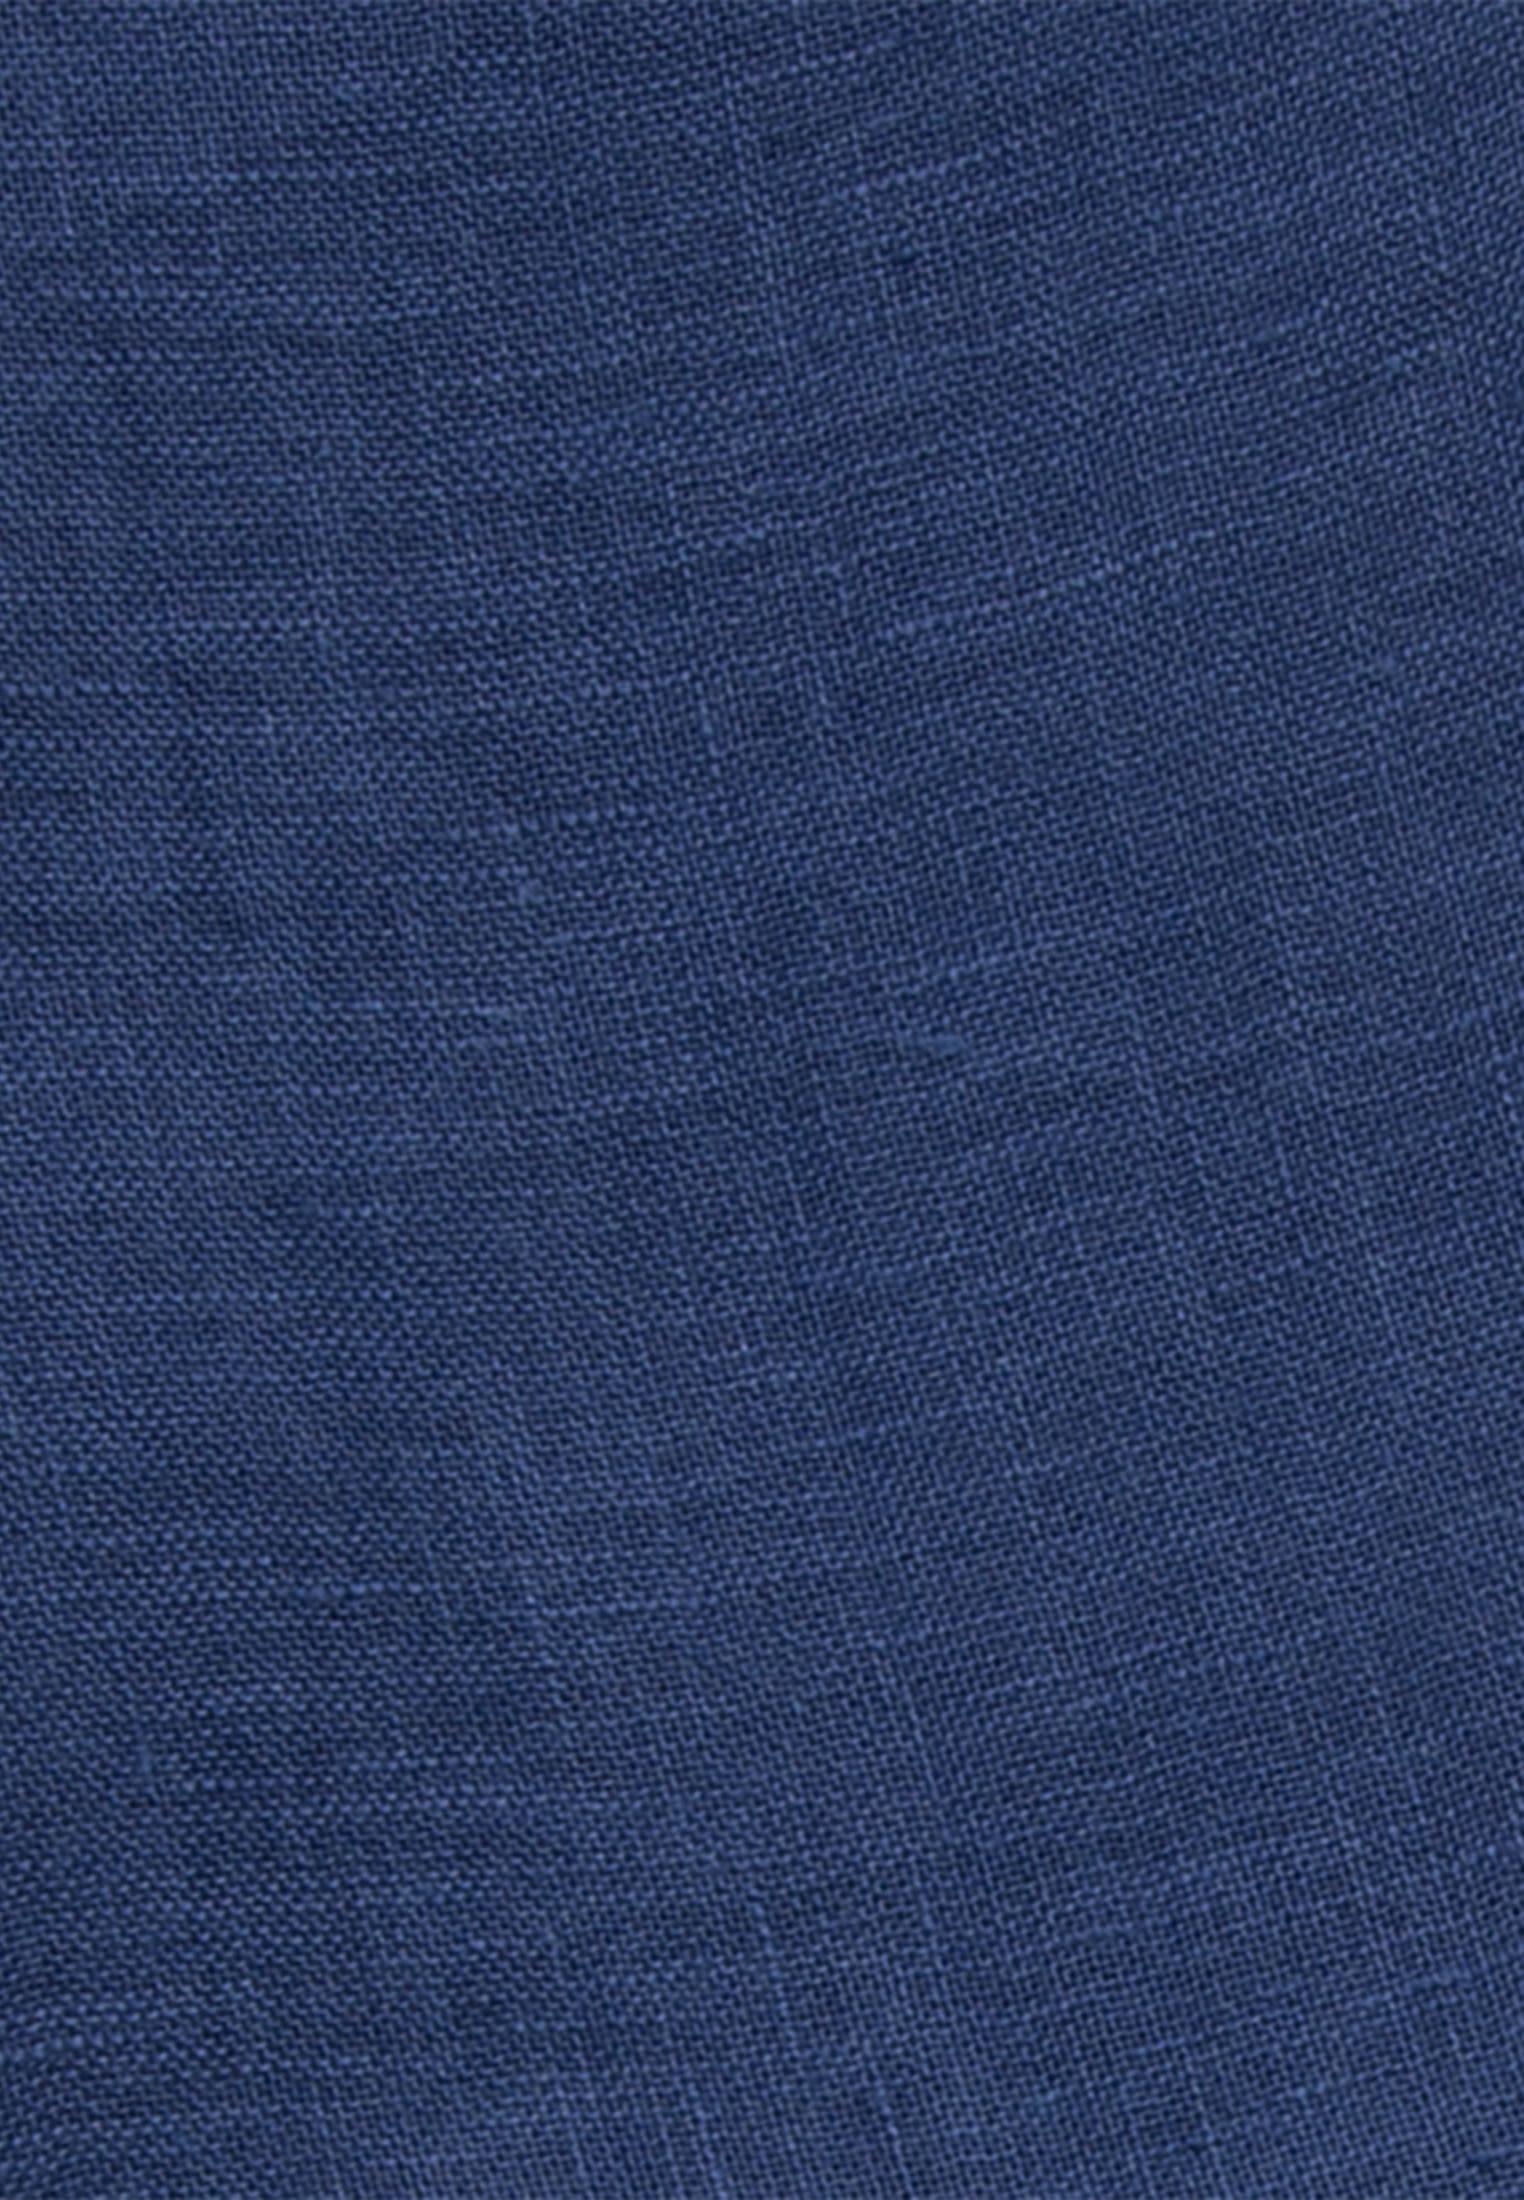 Schal aus 100% Leinen in Dunkelblau |  Jacques Britt Onlineshop